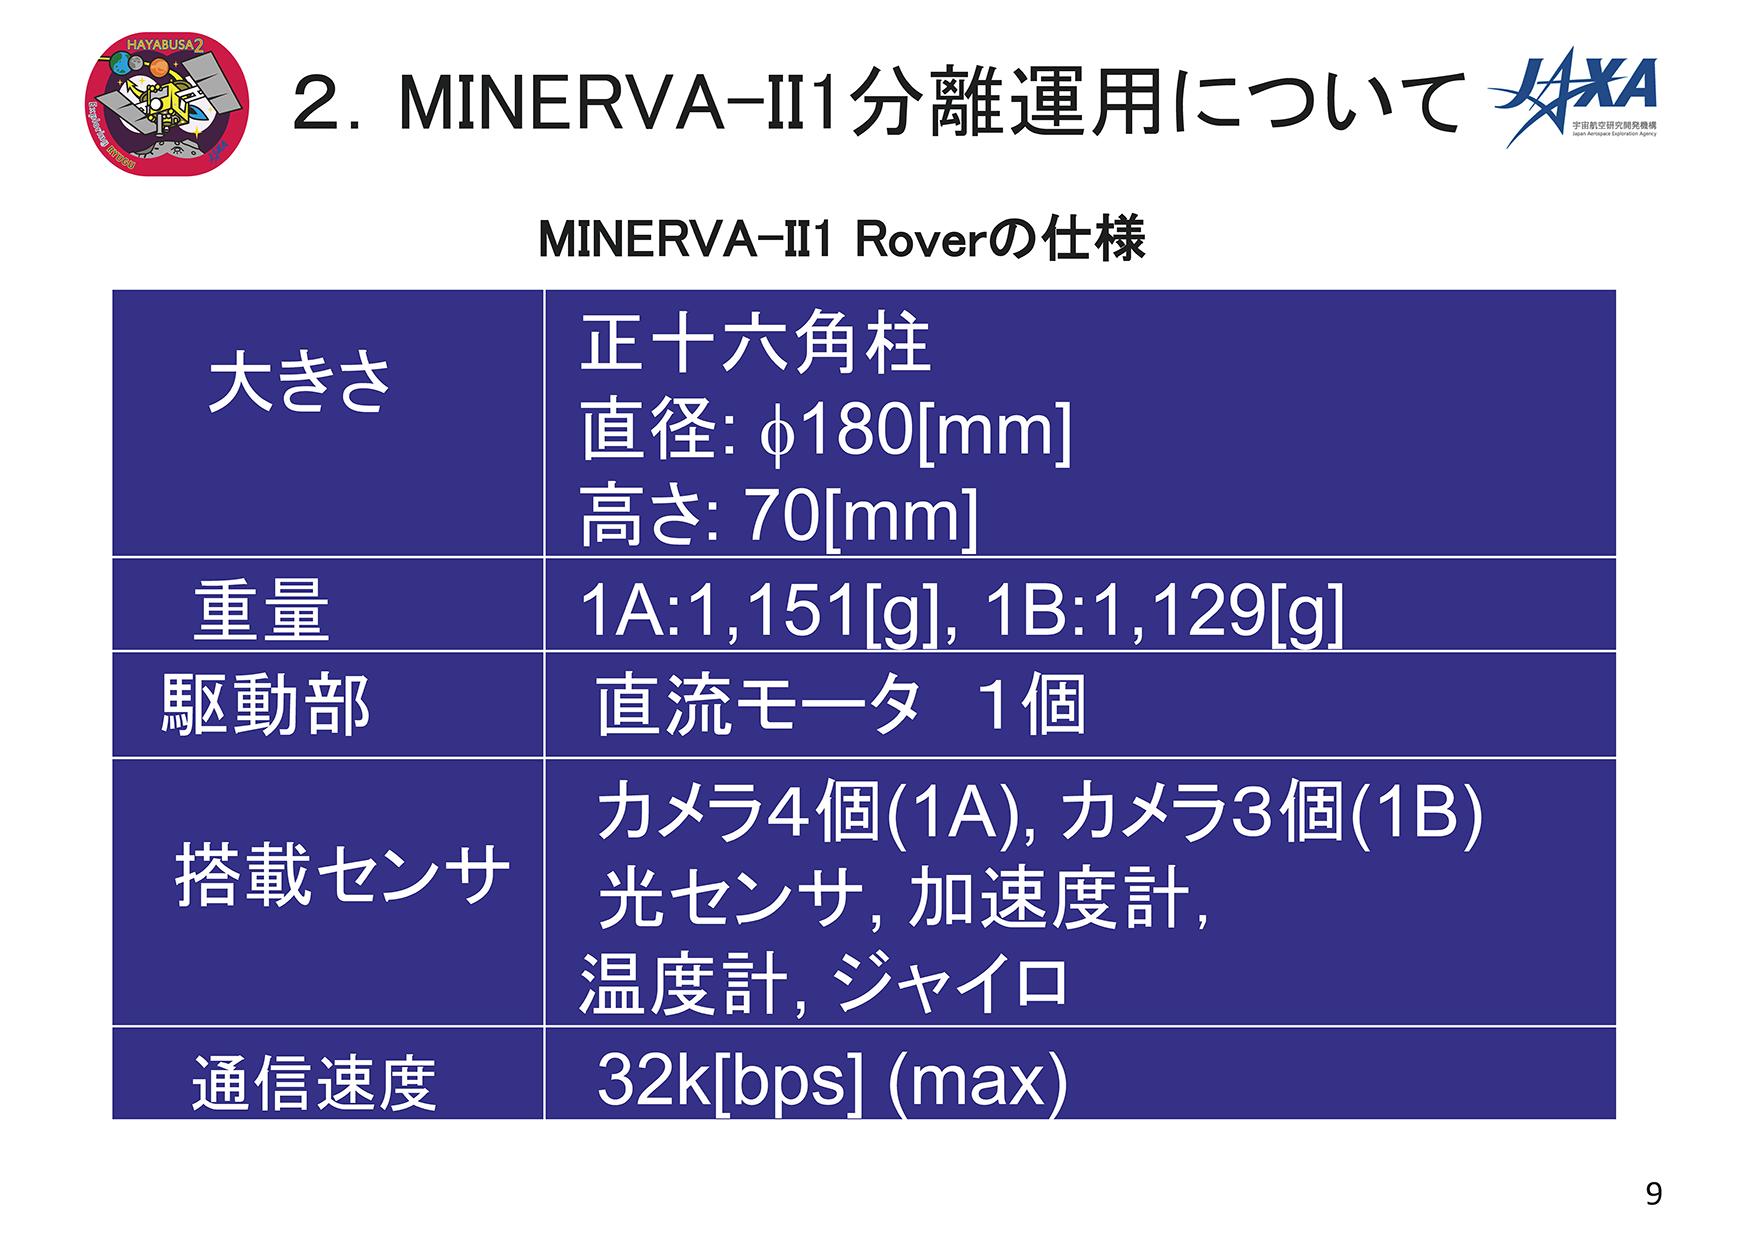 f:id:Imamura:20180921145459p:plain